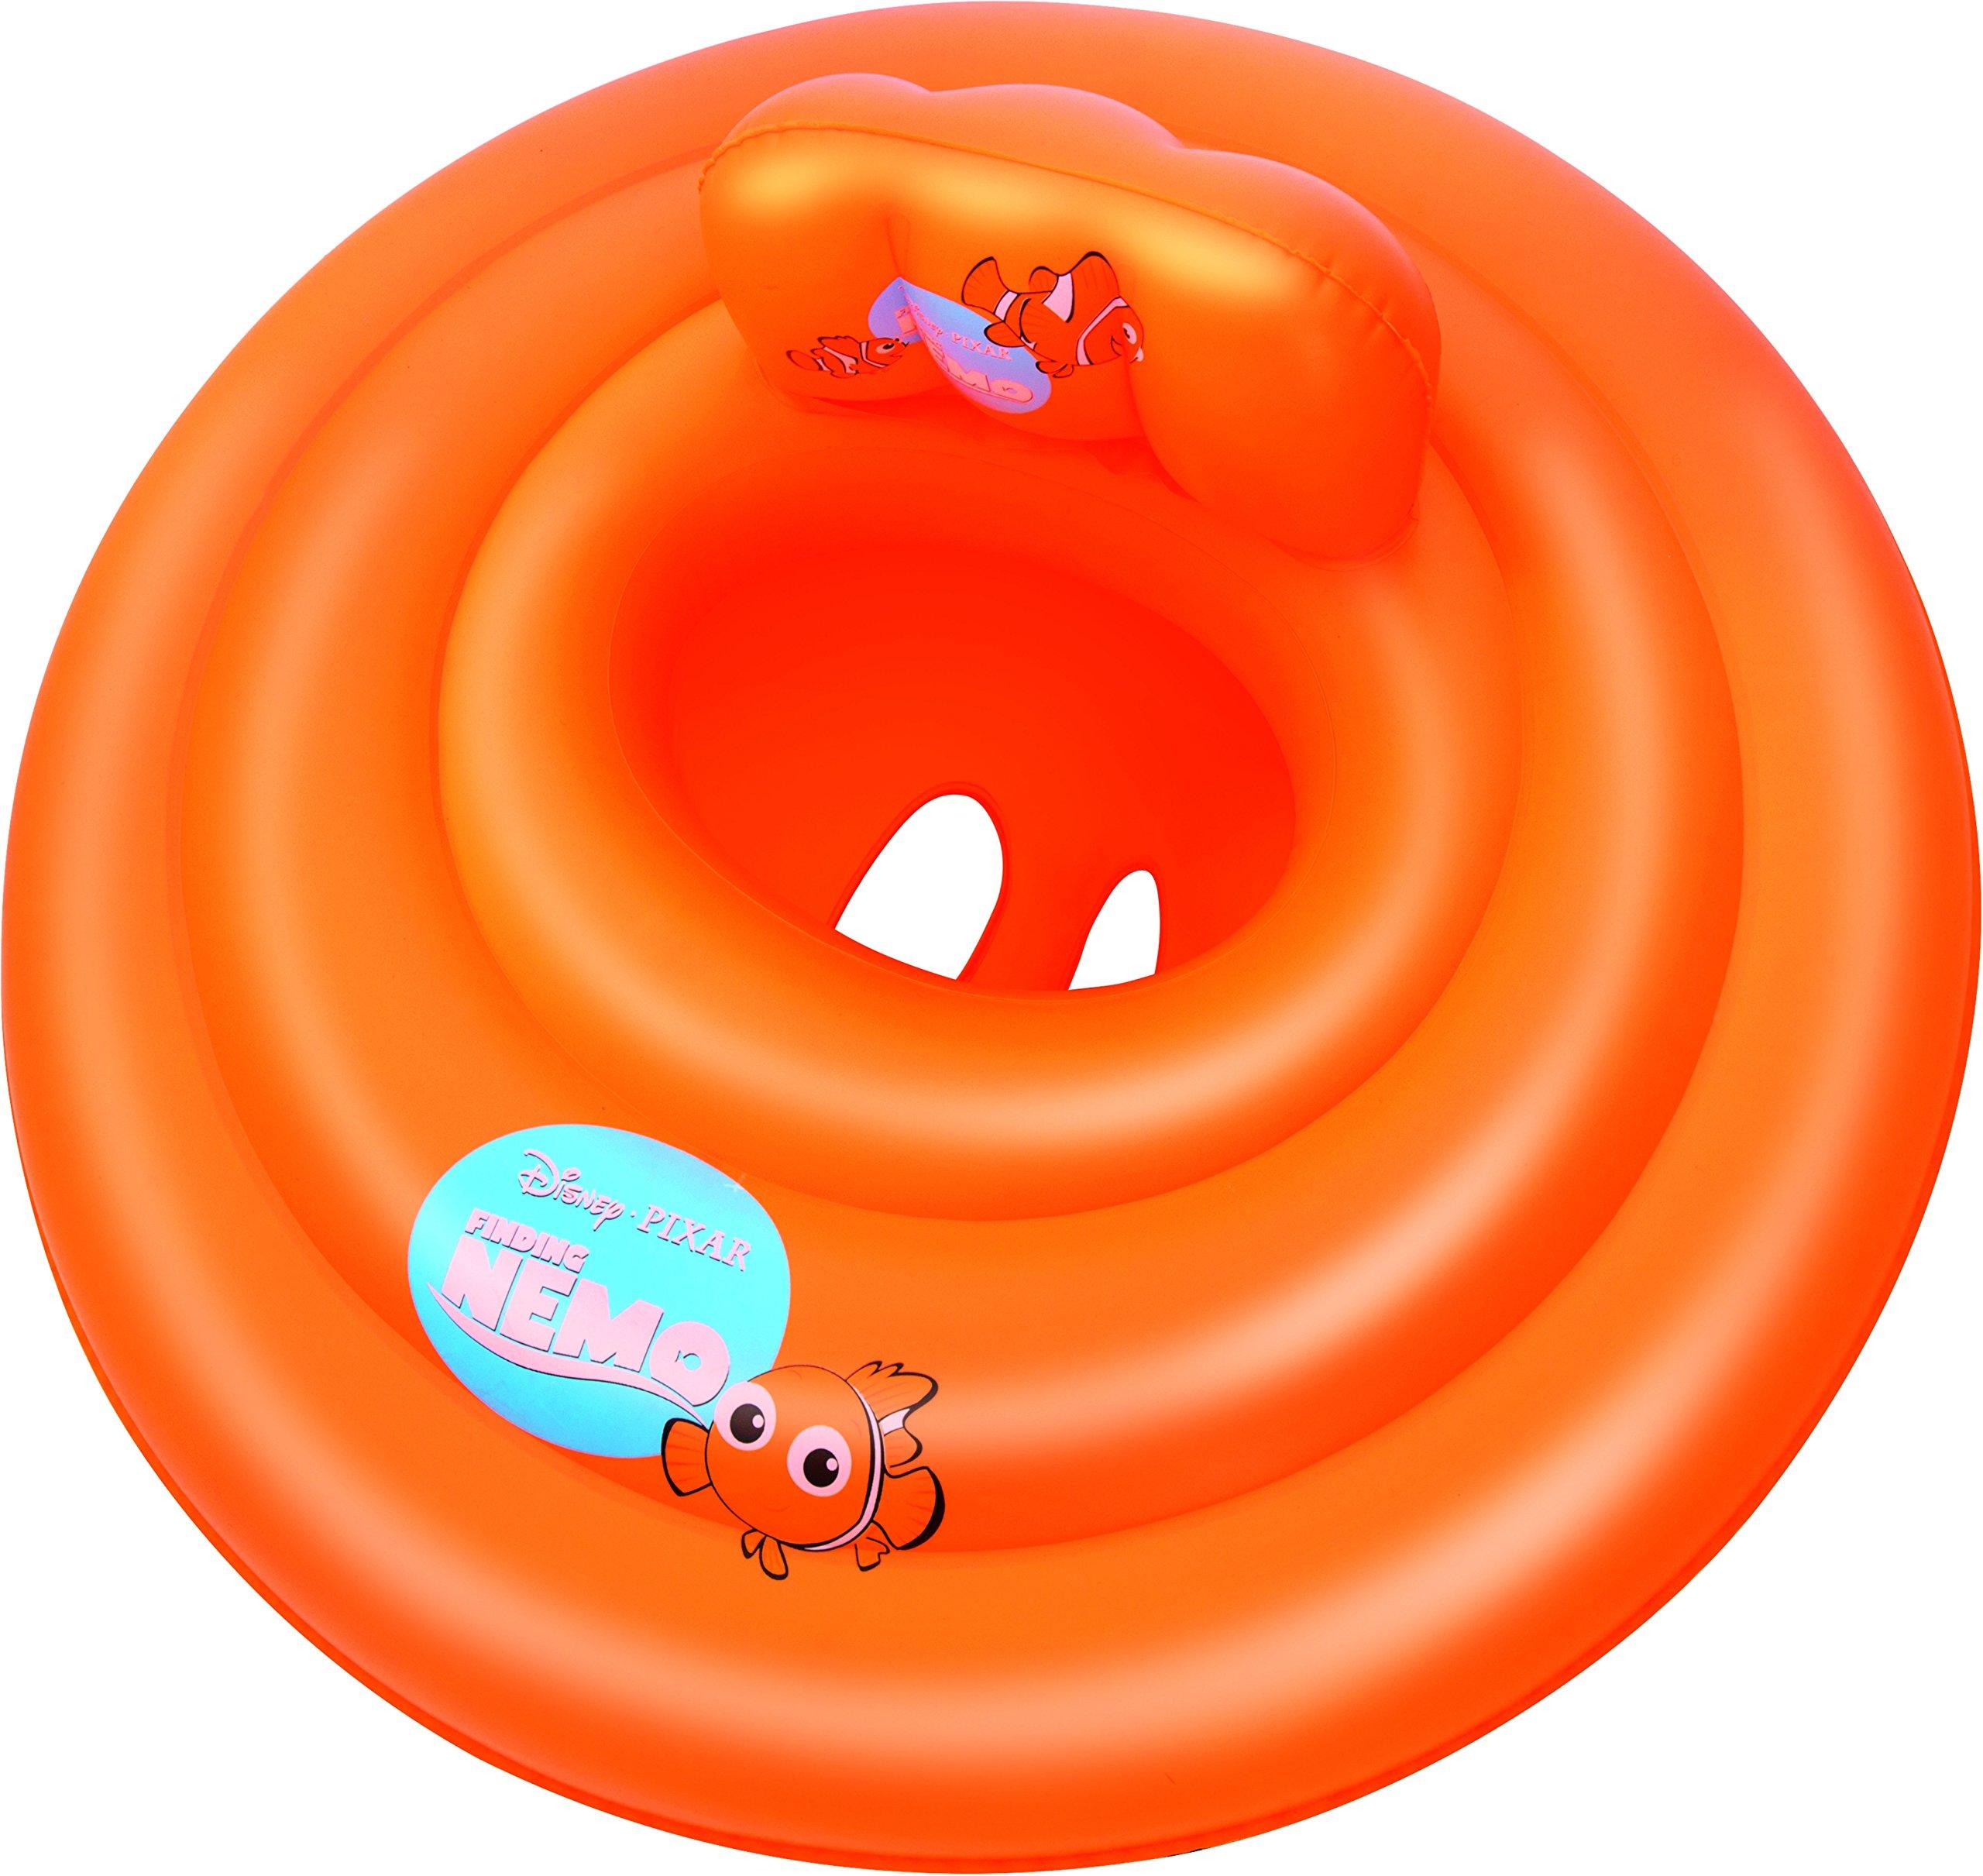 Disney Finding Nemo Baby Seat by Bestway